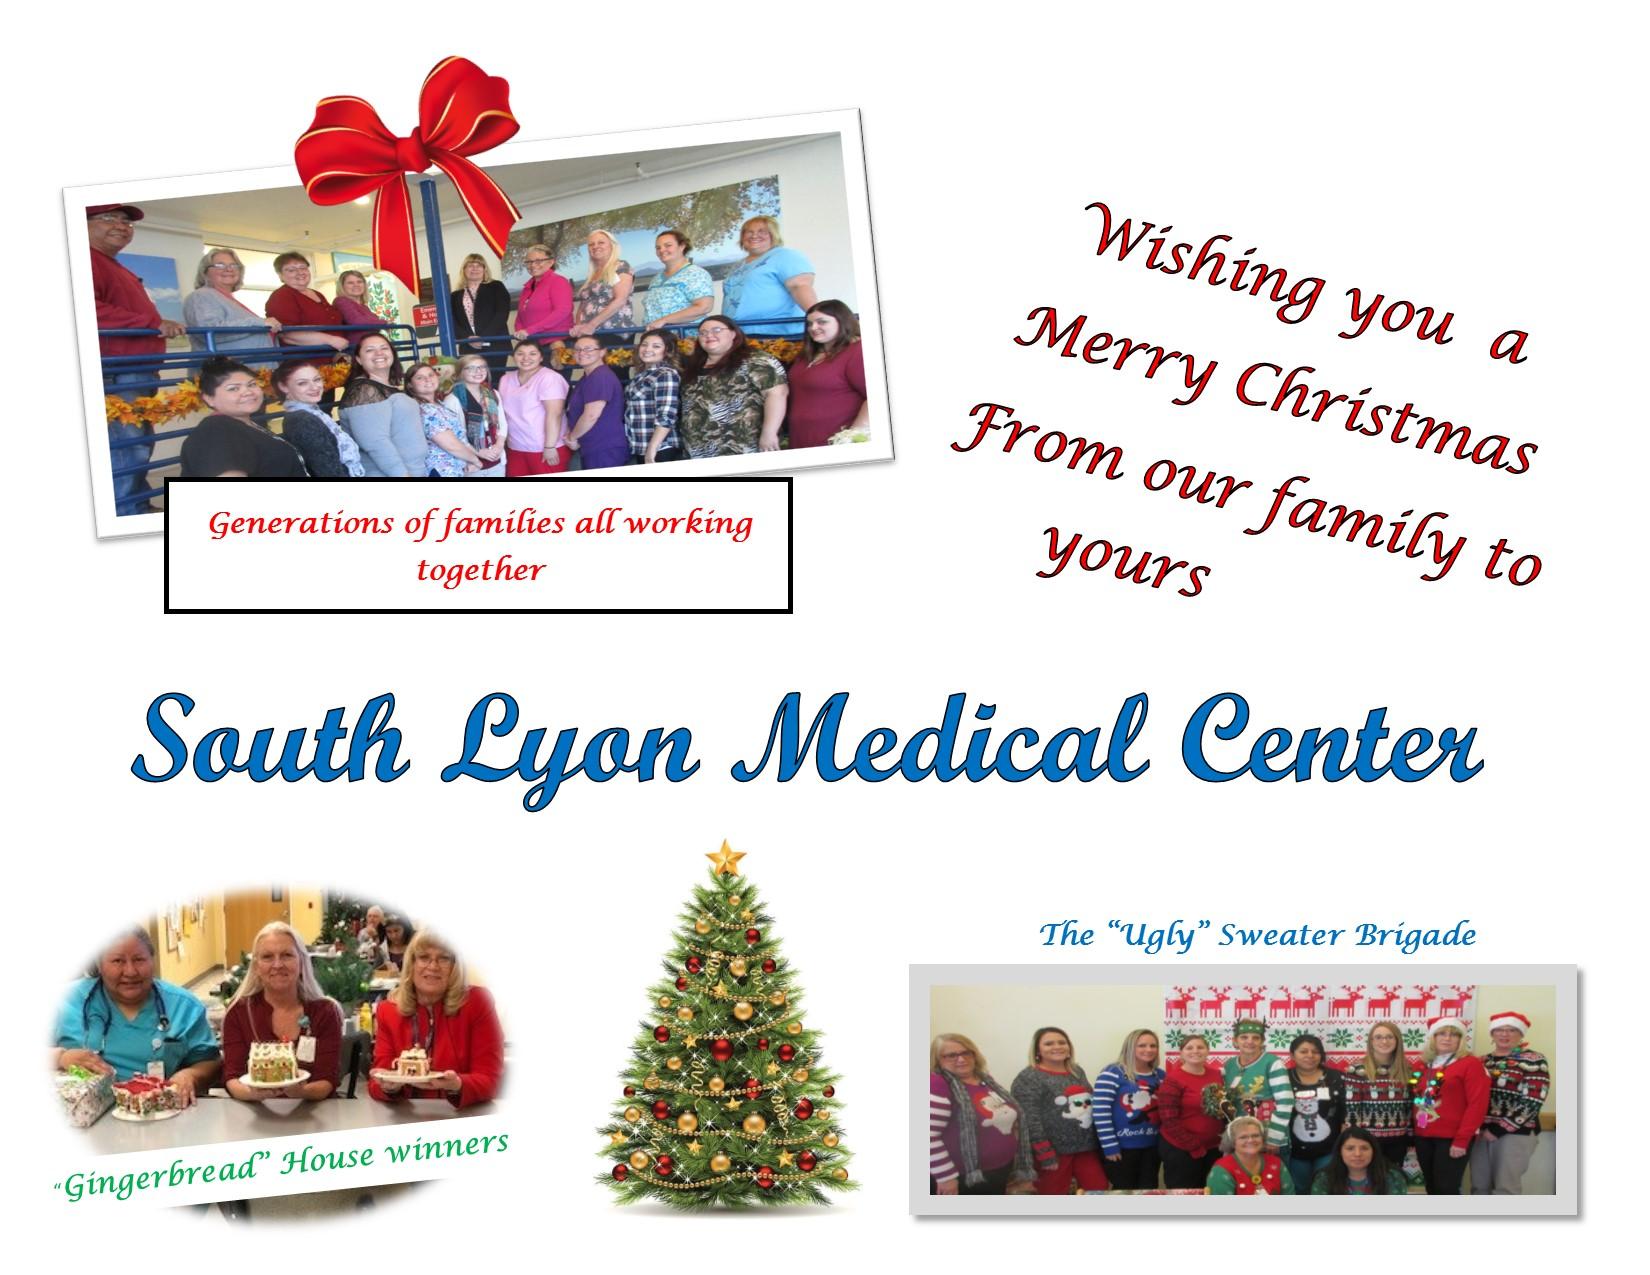 Merry Christmas 2017 – South Lyon Medical Center